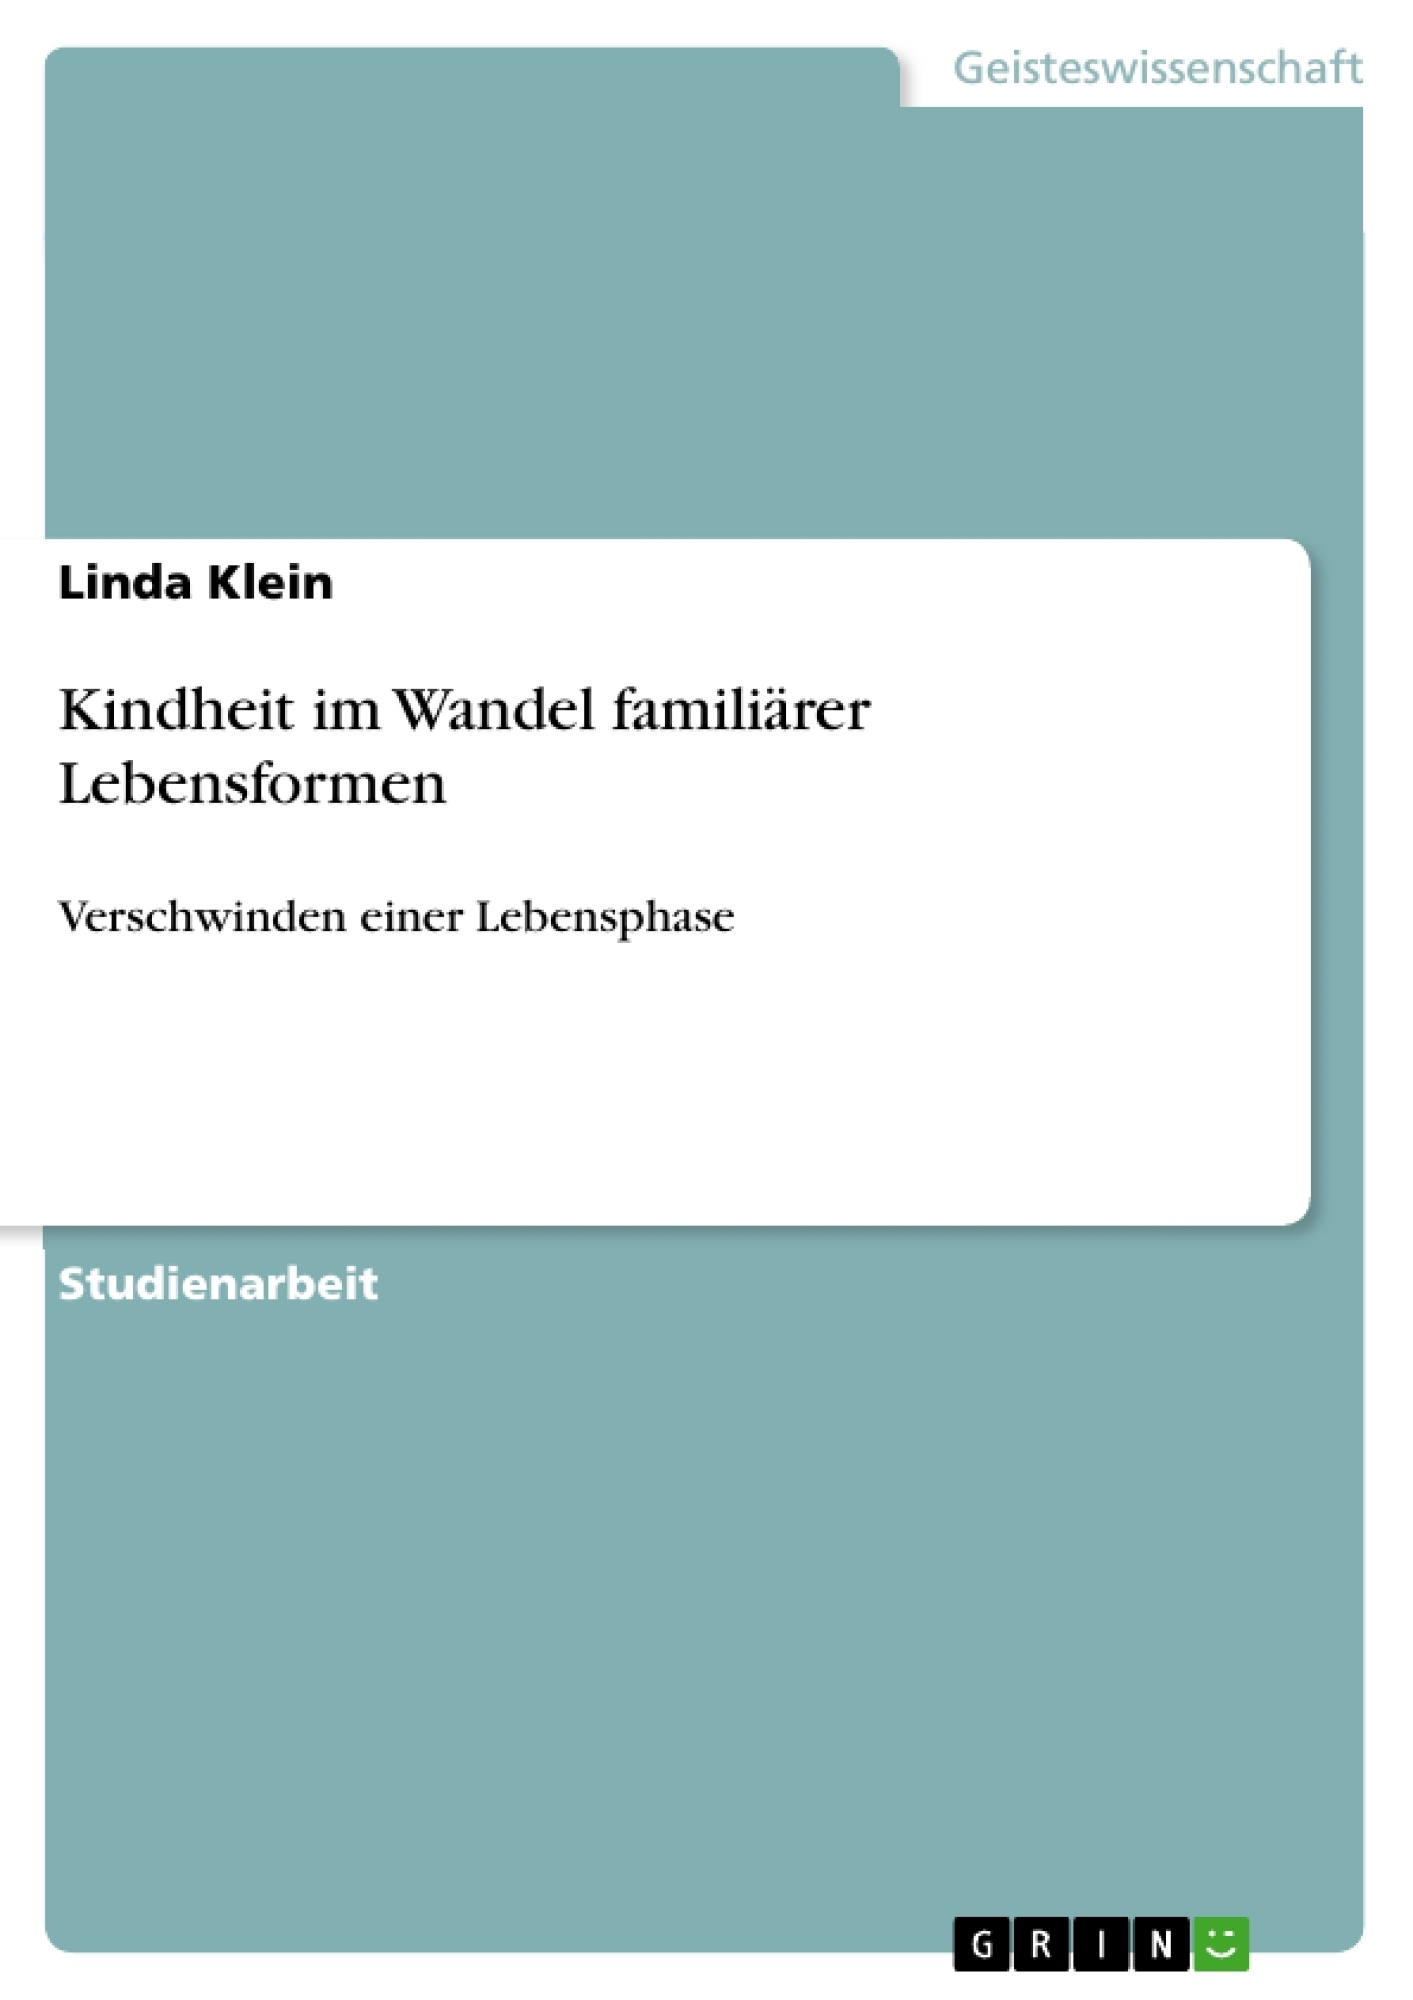 Titel: Kindheit im Wandel familiärer Lebensformen